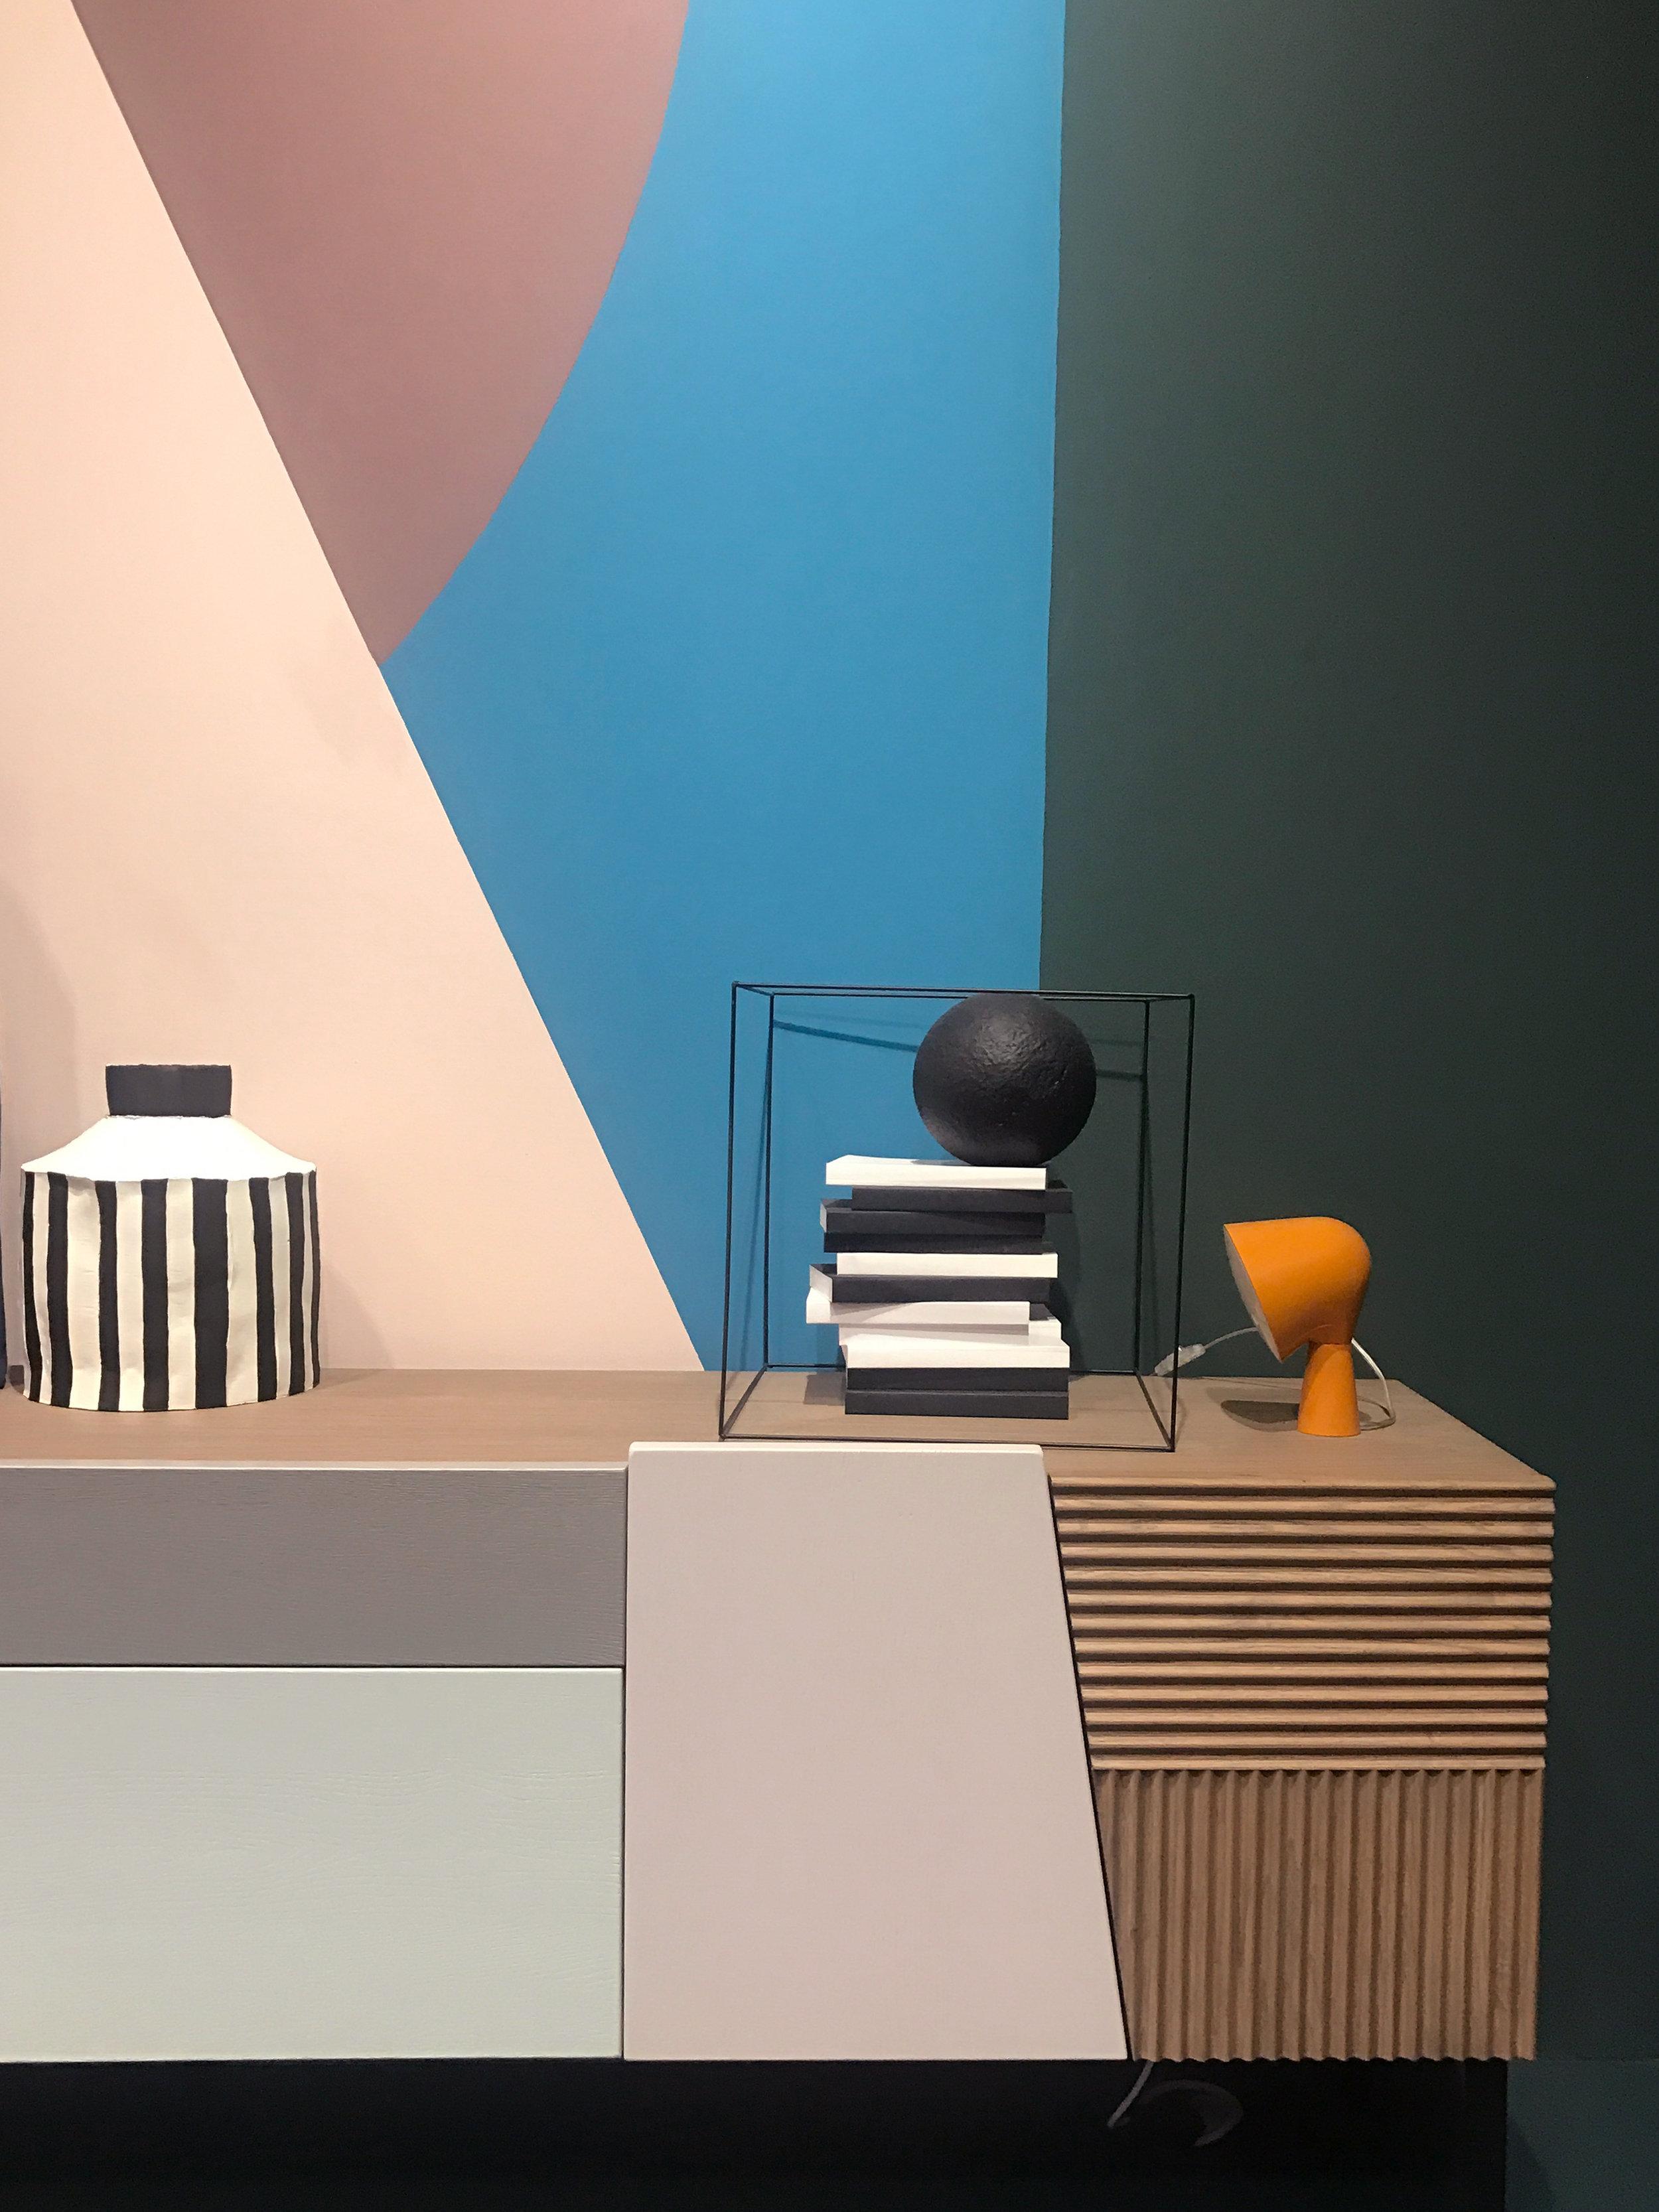 A_LONDON_Salone_del_Mobile_Milan_Design_Week_04.jpg